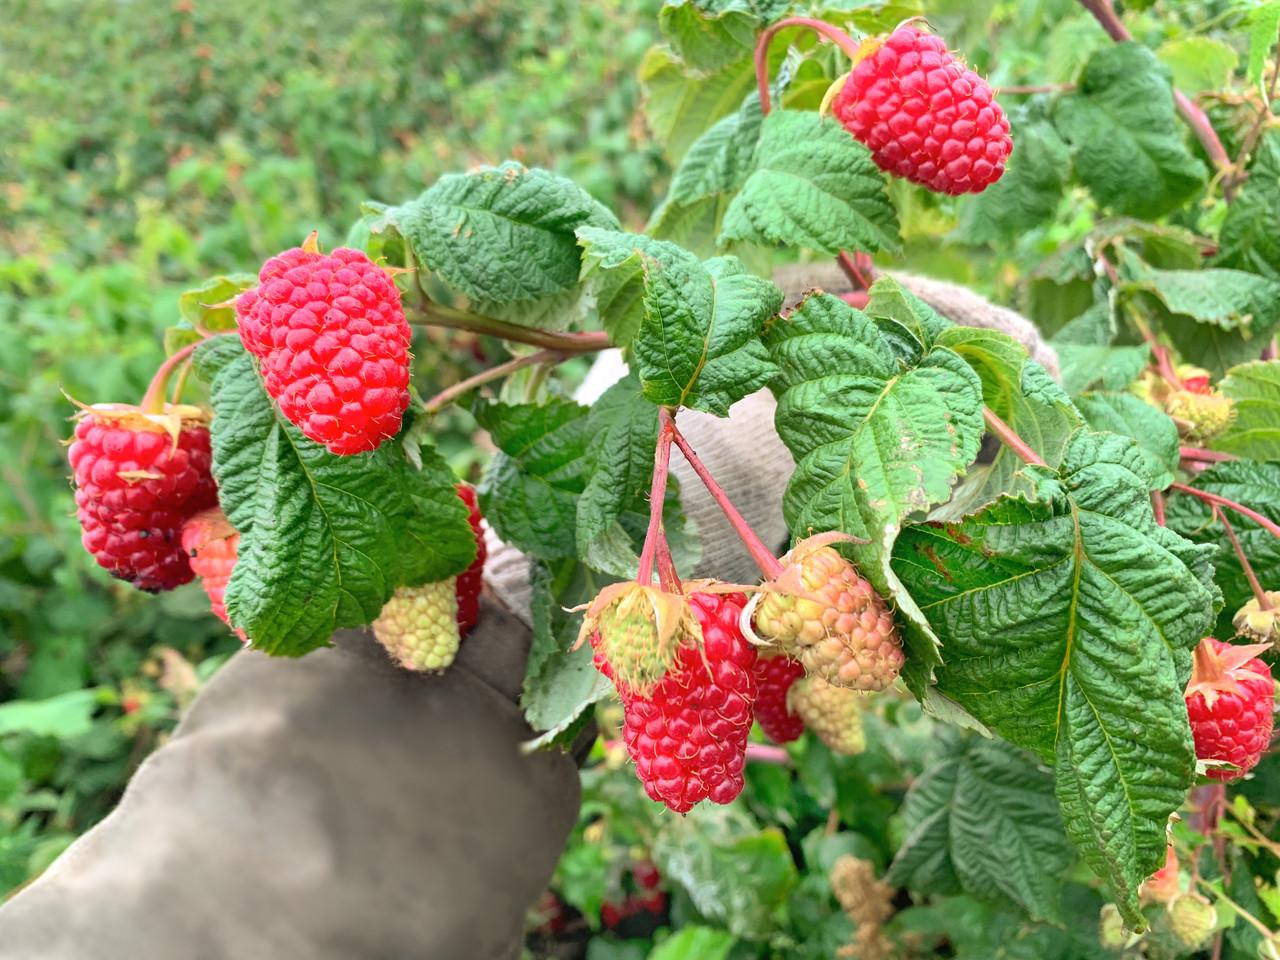 Малина: посадка и уход, выращивание в саду, обрезка и размножение